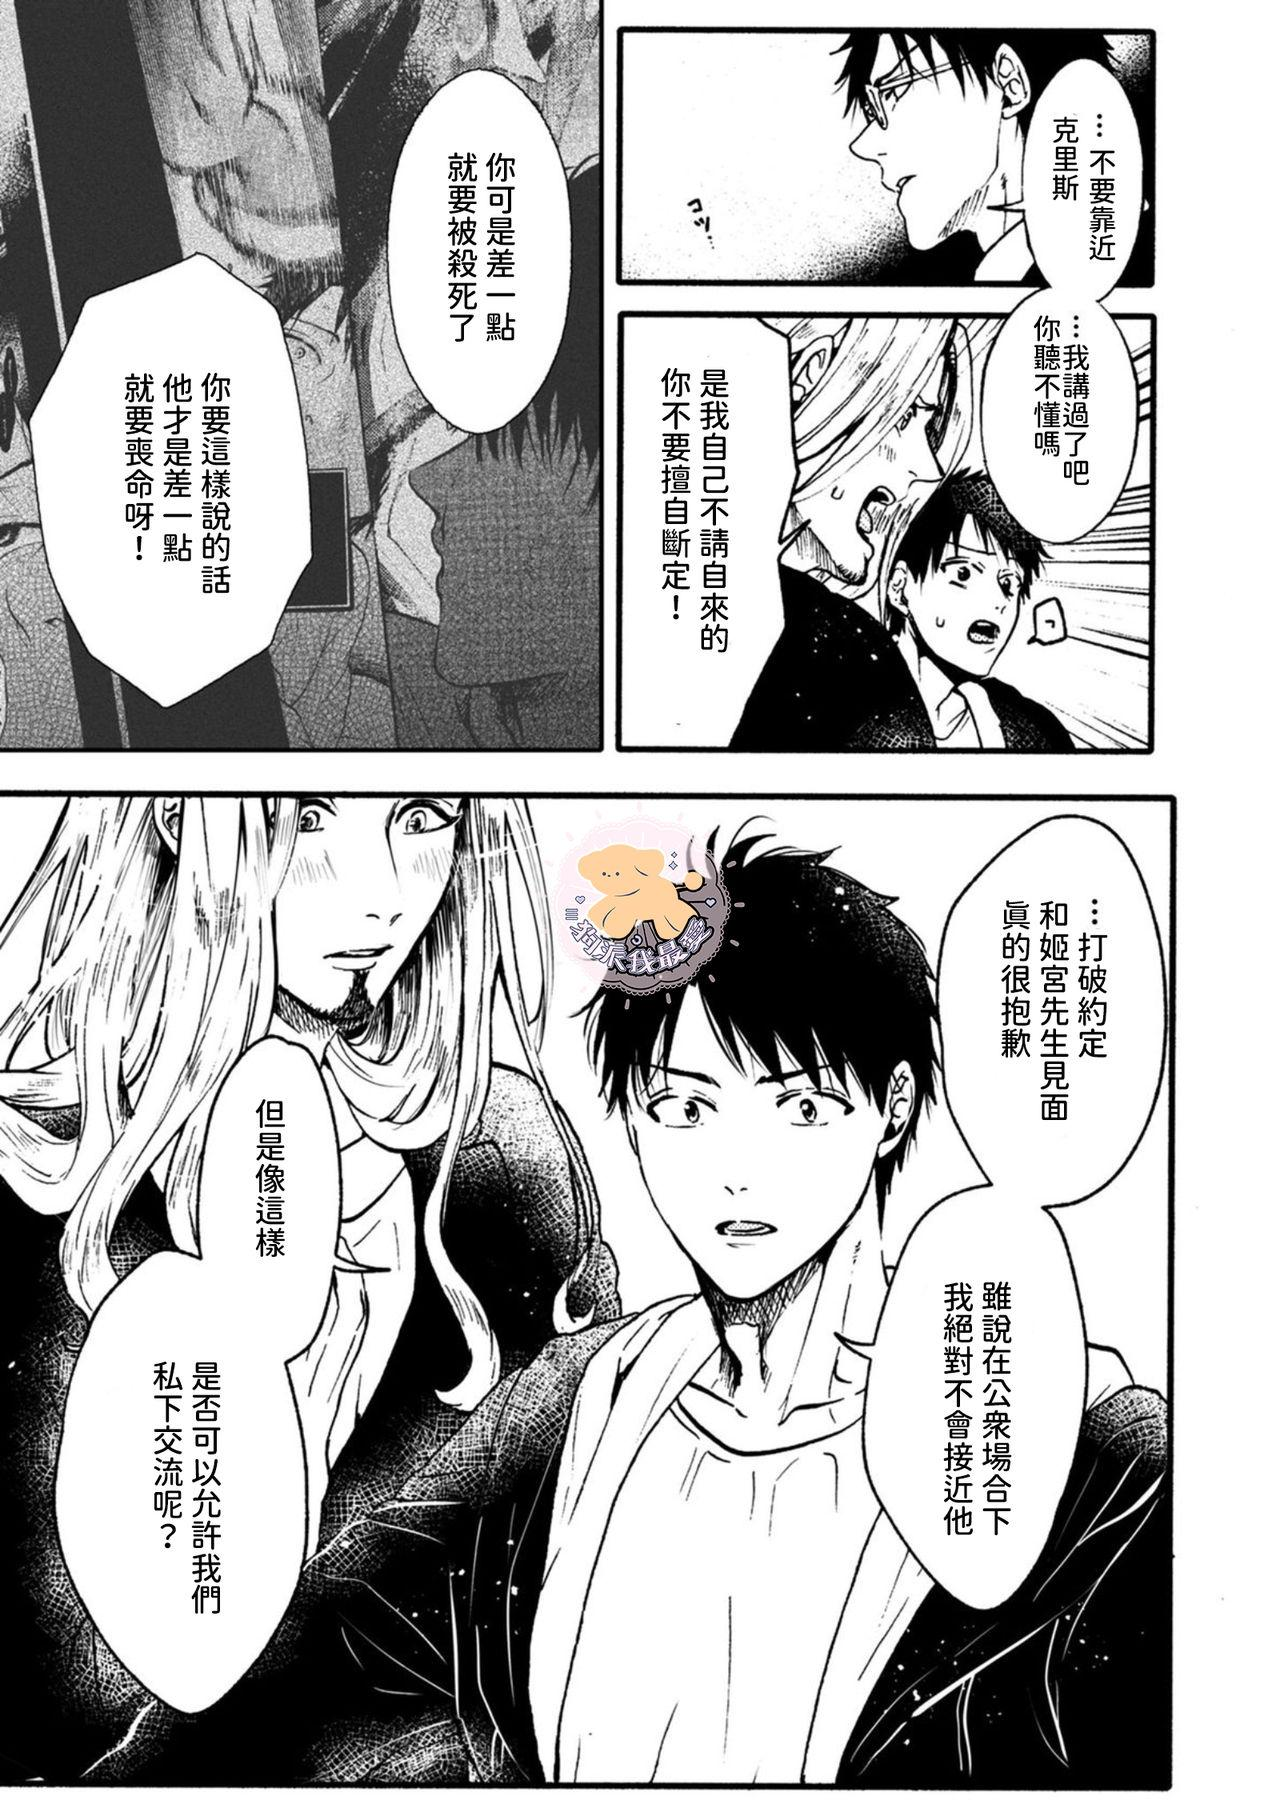 Tensei Hime♂To Tensei Ouji -轉生公主♂與轉生王子 Ch.4 29